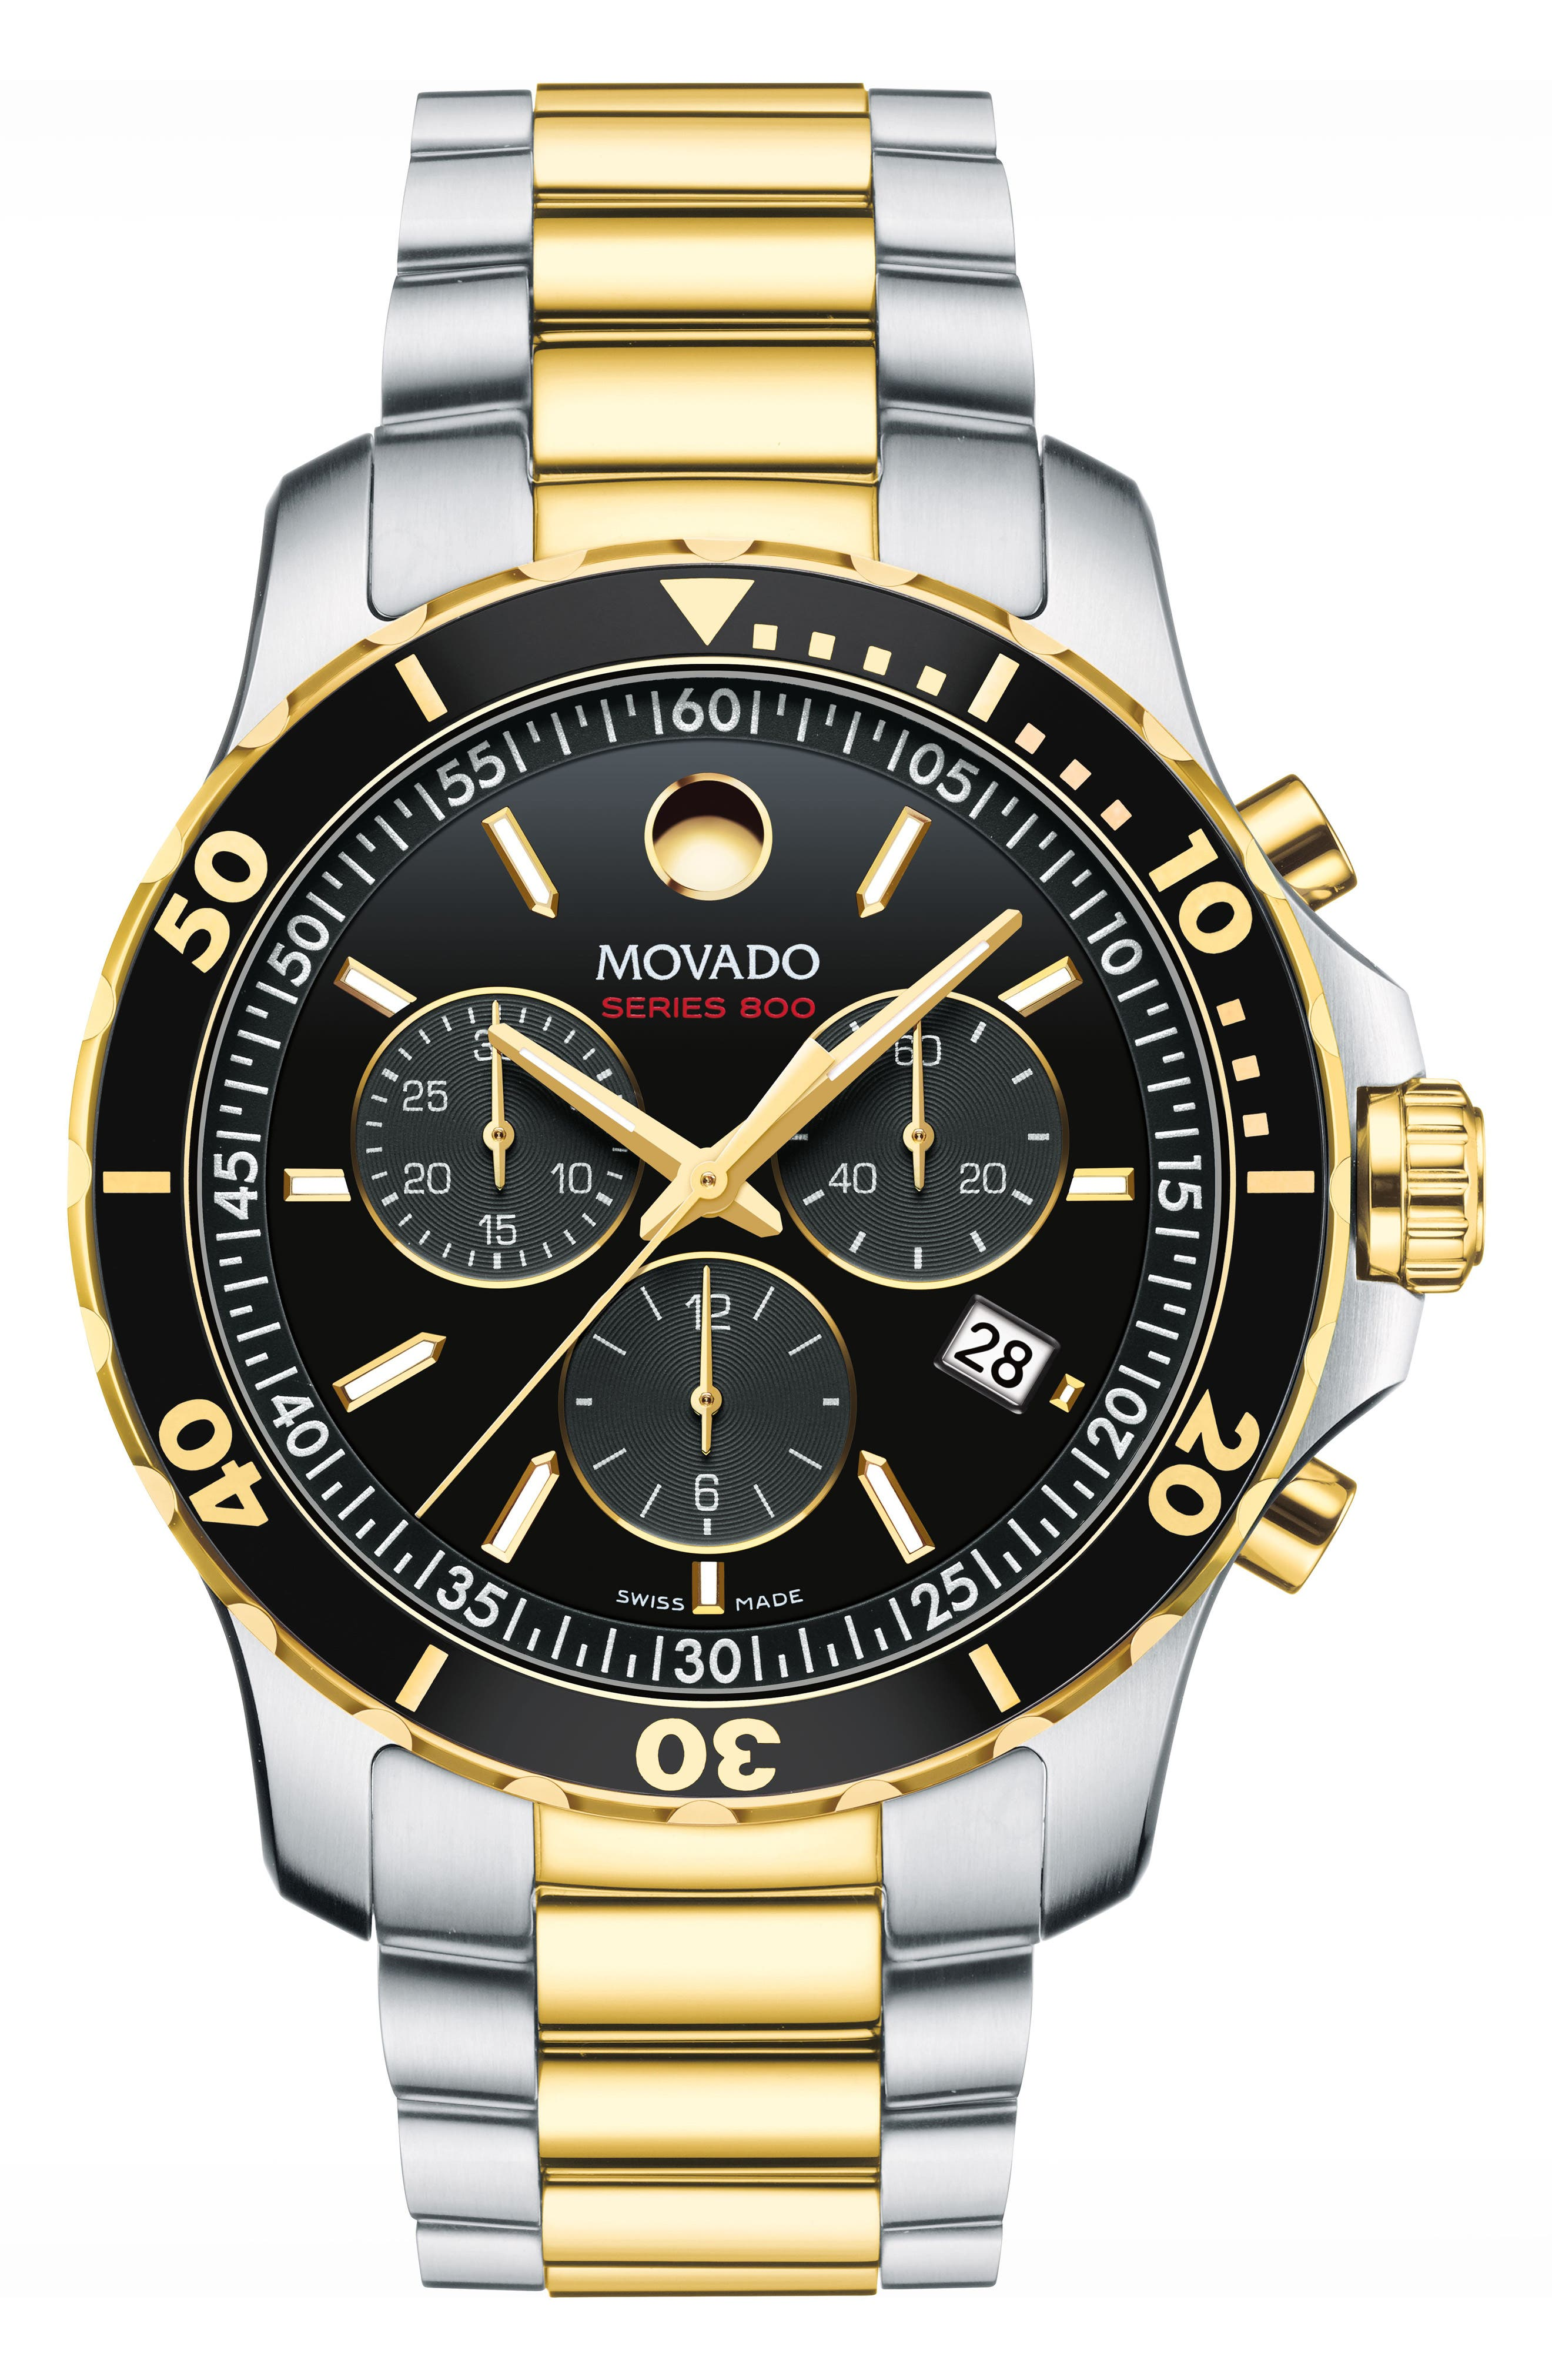 Main Image - Movado 'Series 800' Chronograph Bracelet Watch, 42mm